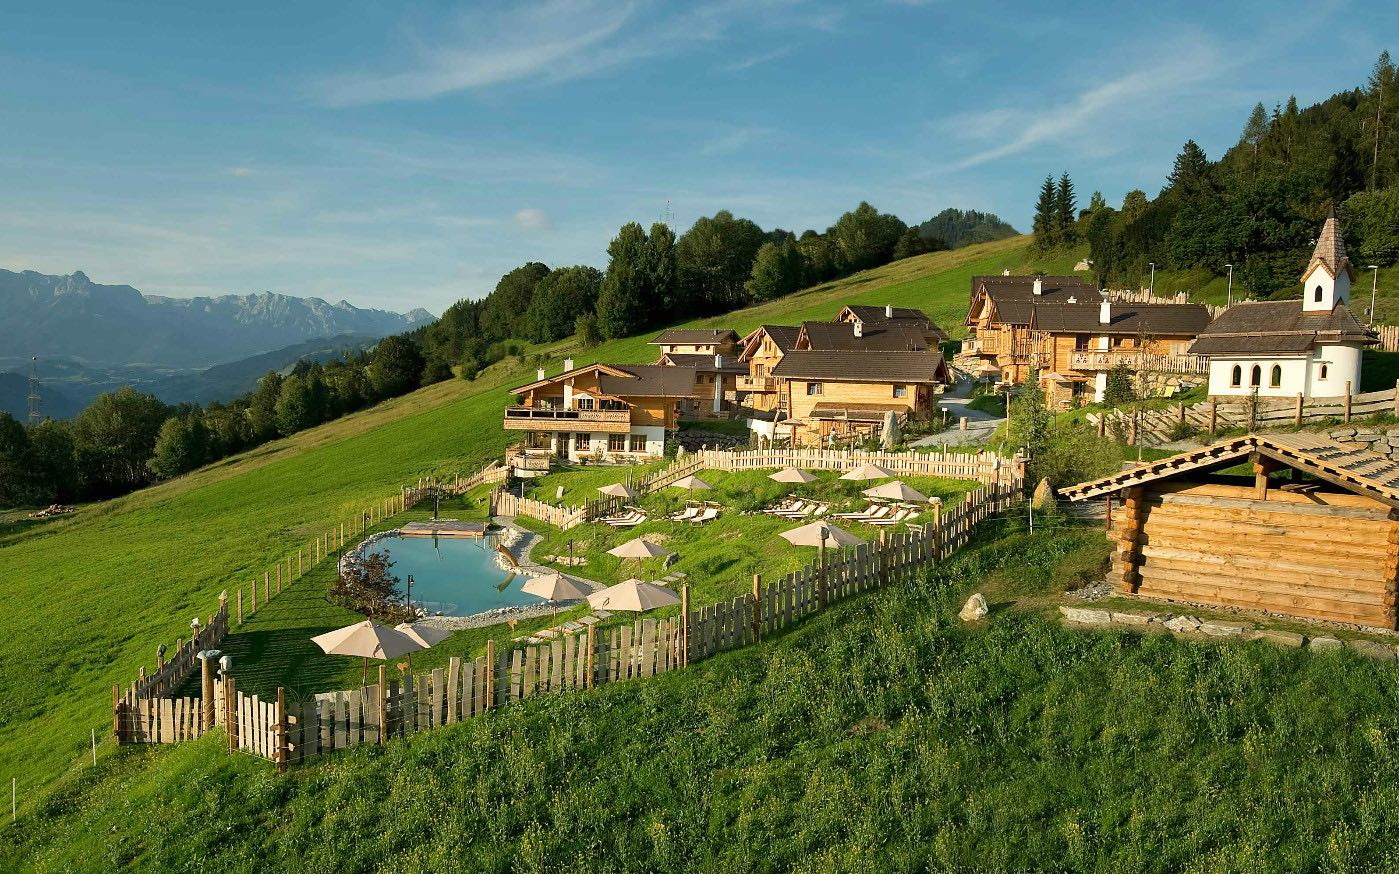 Erholung in Österreich ganzjährig im Almdorf Sankt Johann copyright: Alpendorf Chalets KG & Co. OG